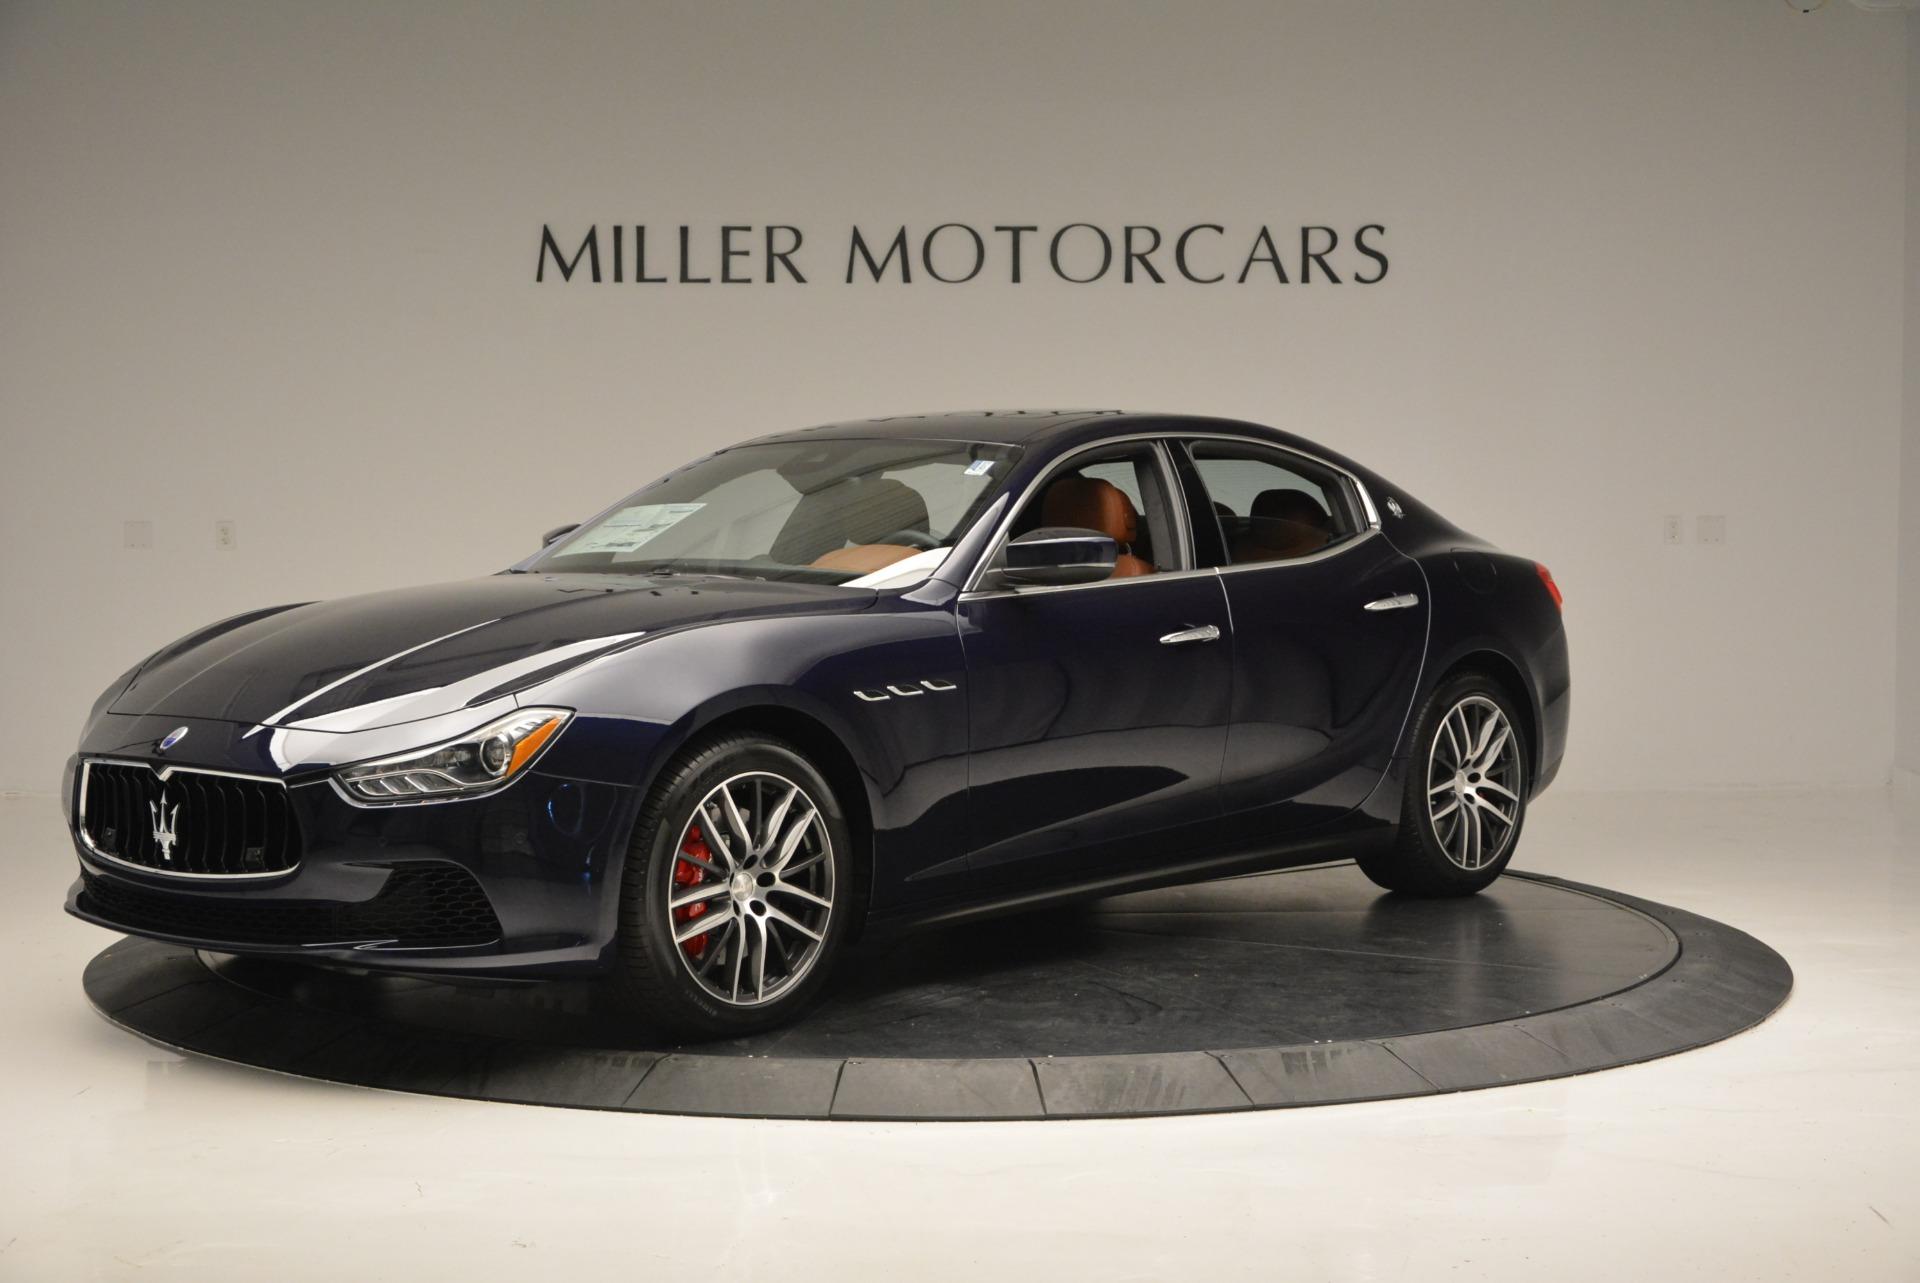 New 2017 Maserati Ghibli S Q4 For Sale In Westport, CT 713_p2